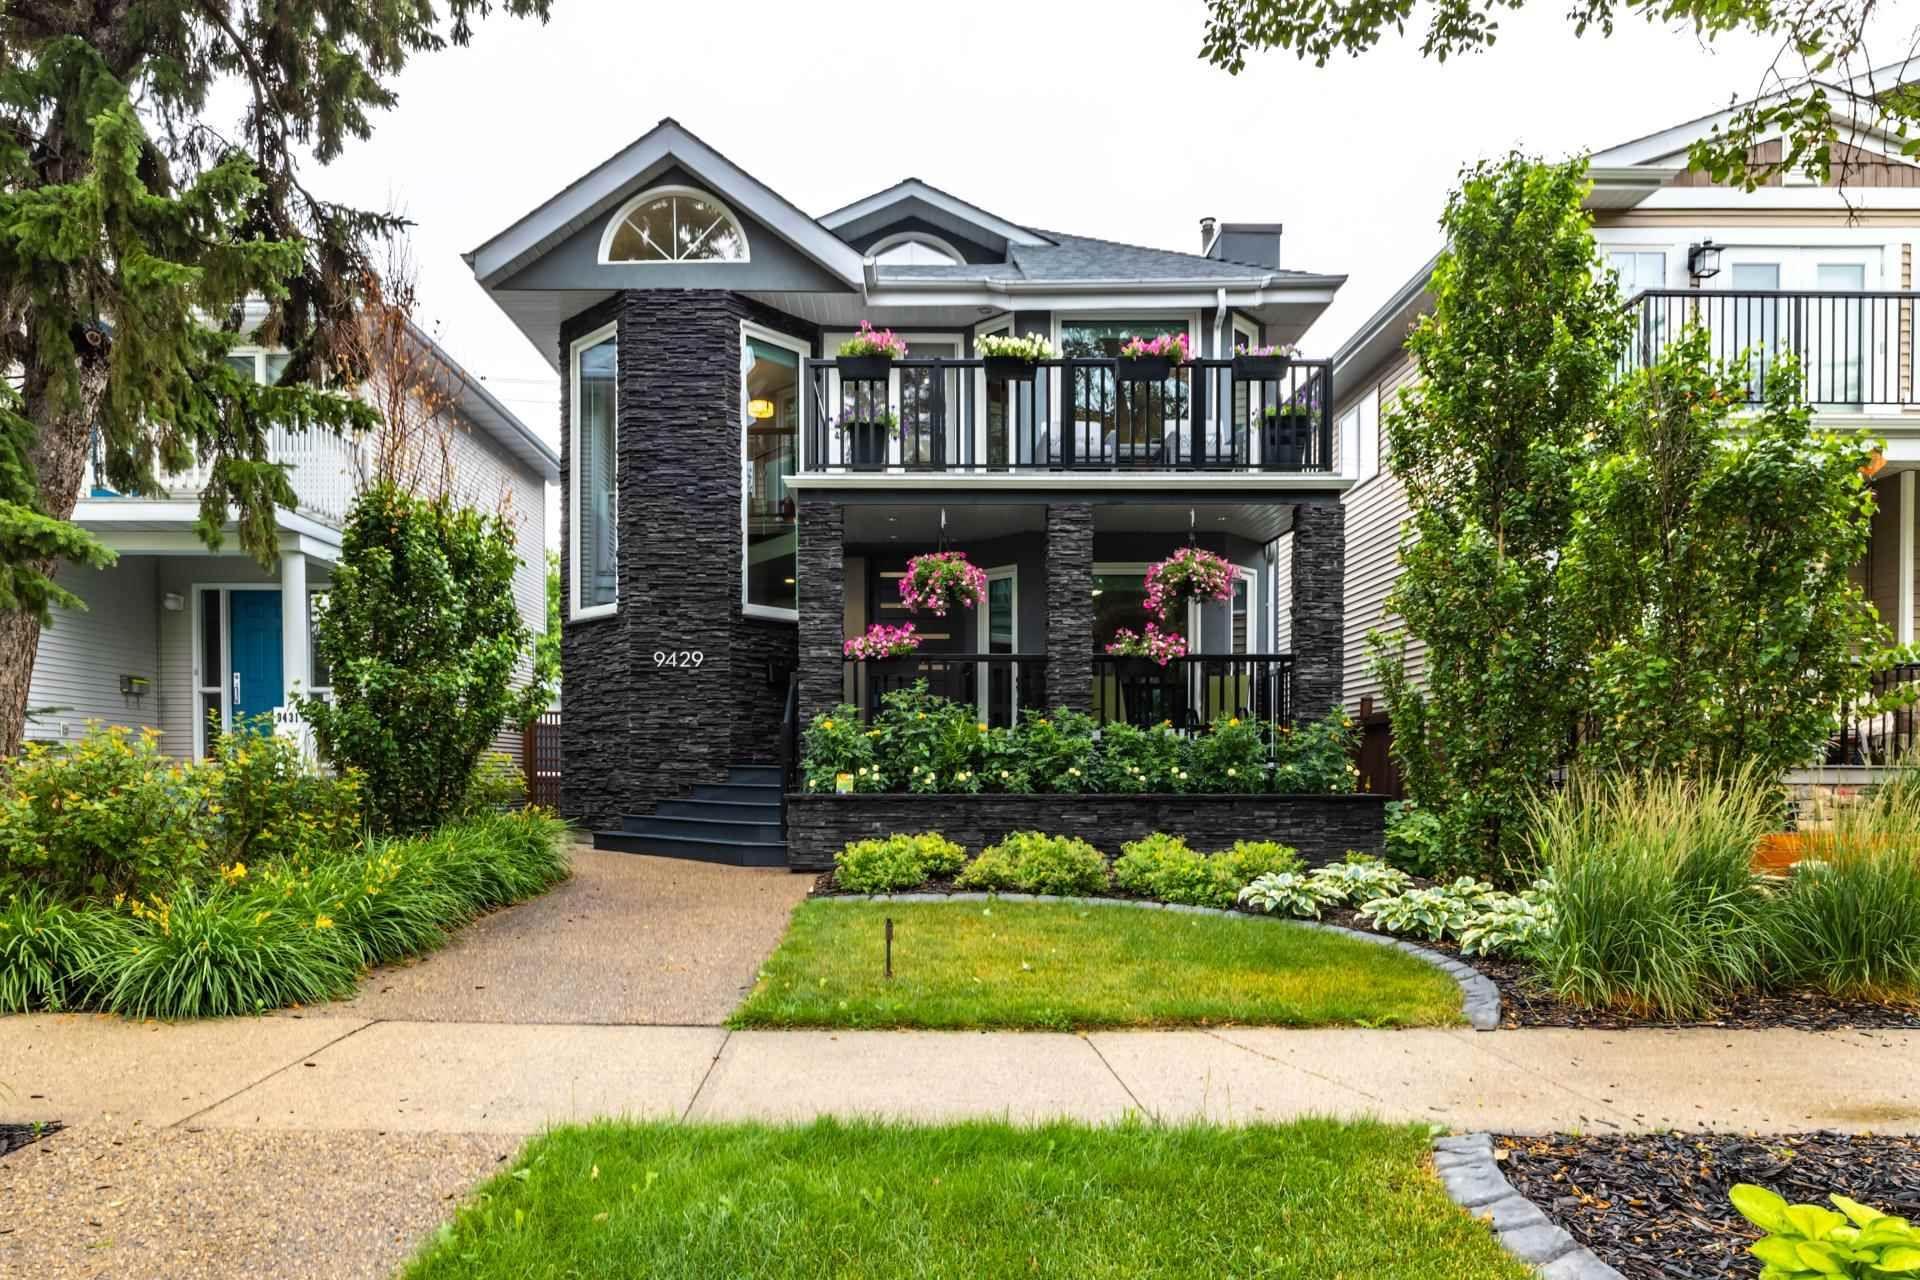 Main Photo: 9429 101 Street in Edmonton: Zone 12 House for sale : MLS®# E4255702